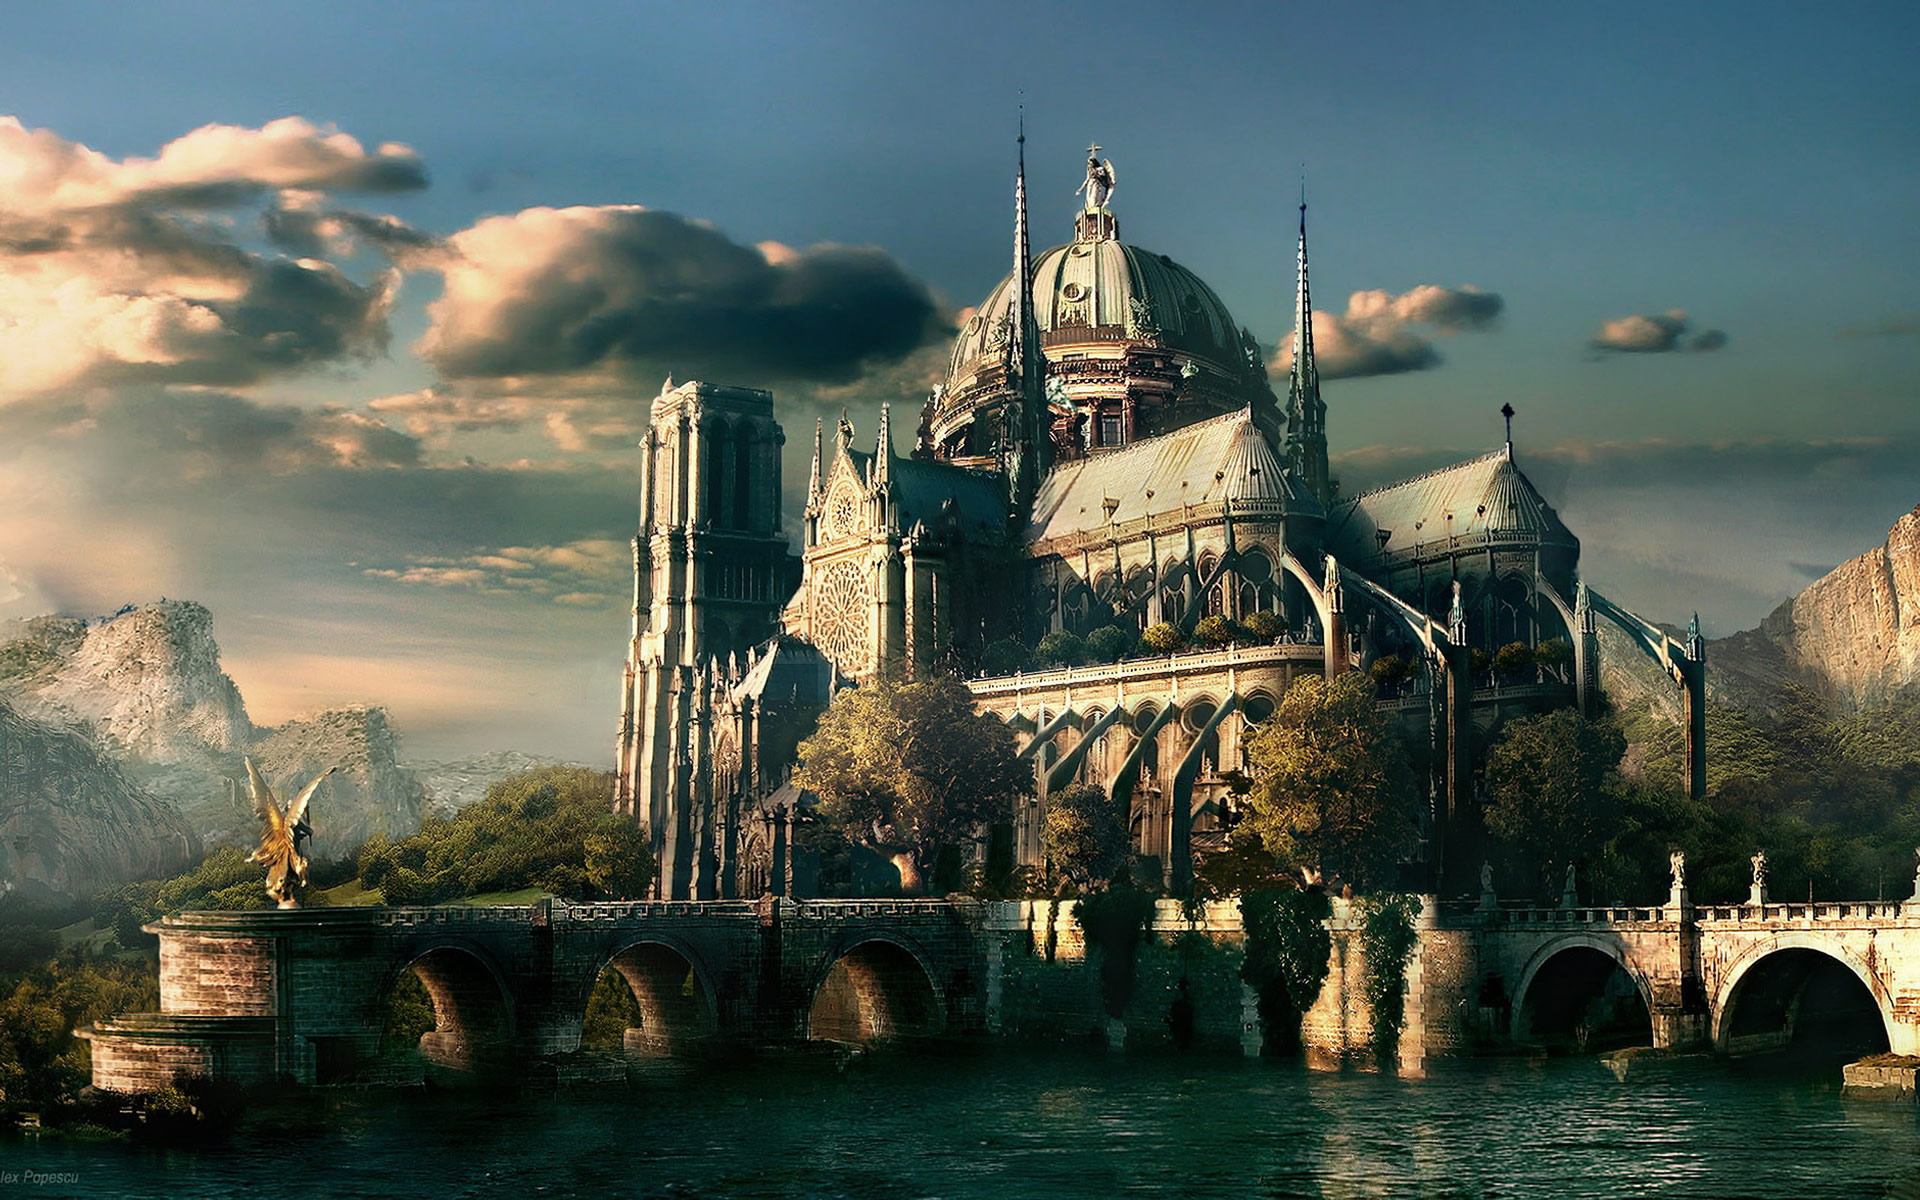 Fantasy World Images Background Hd 2